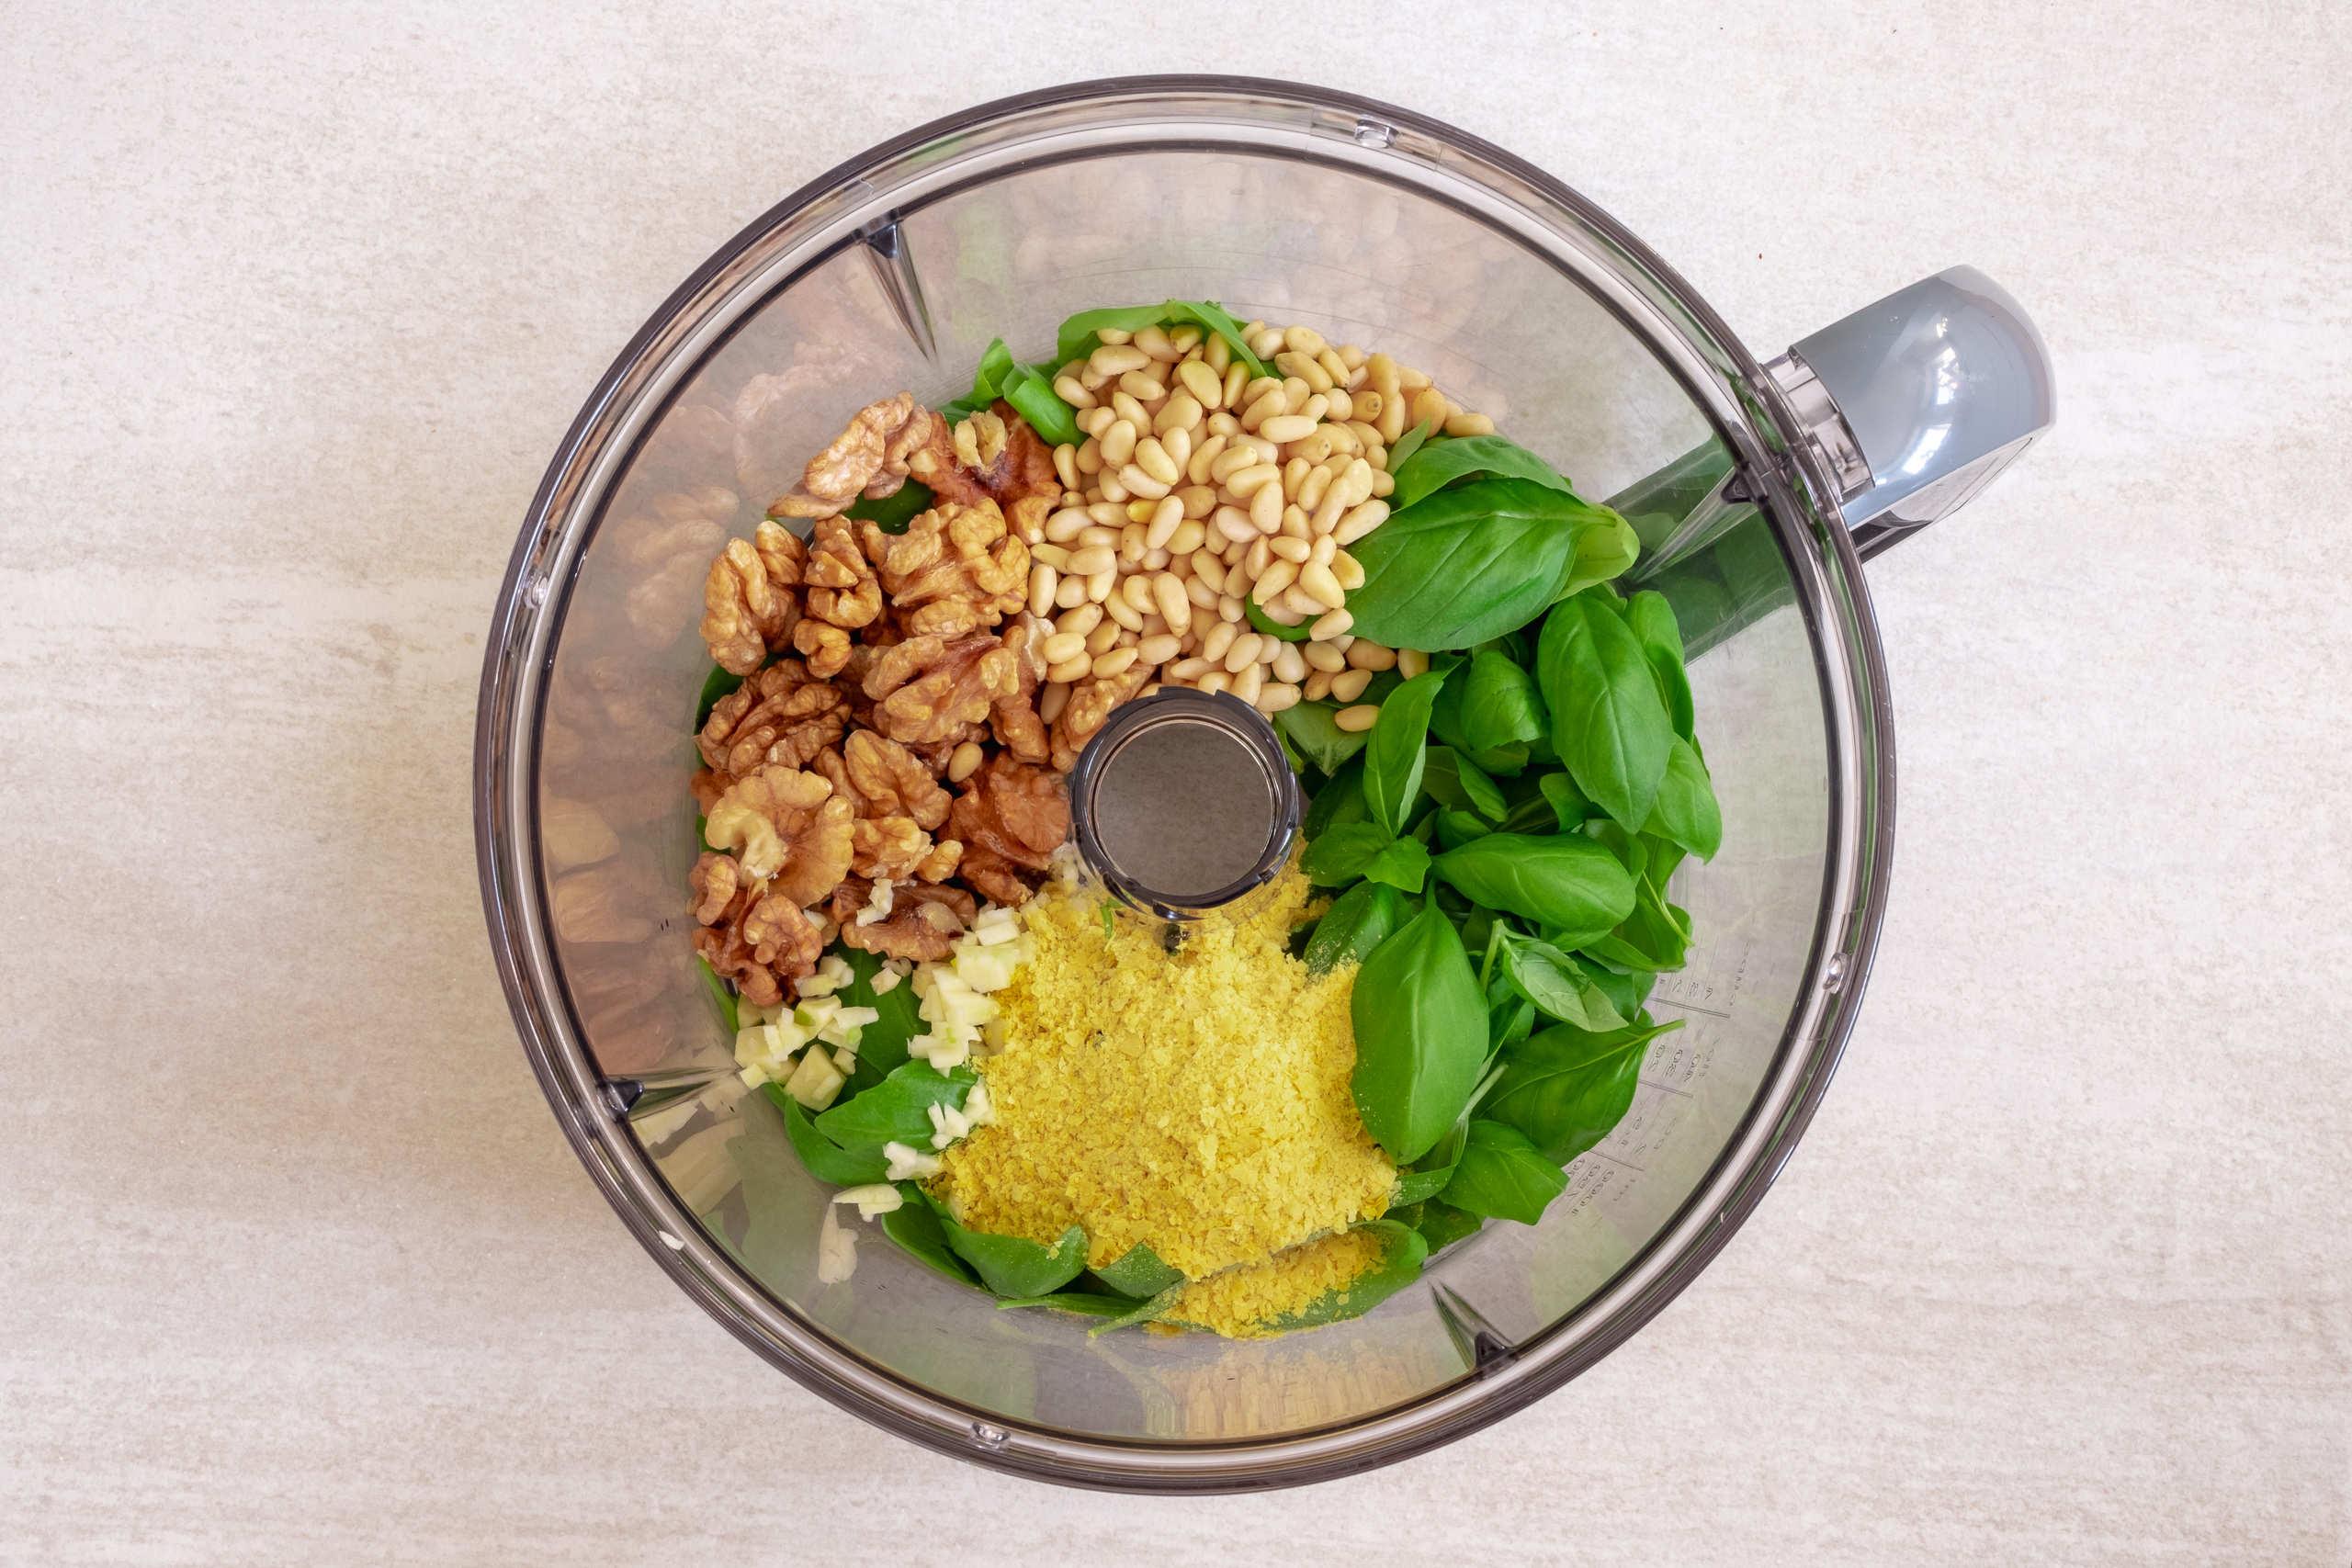 Vegansk pesto med valnötter